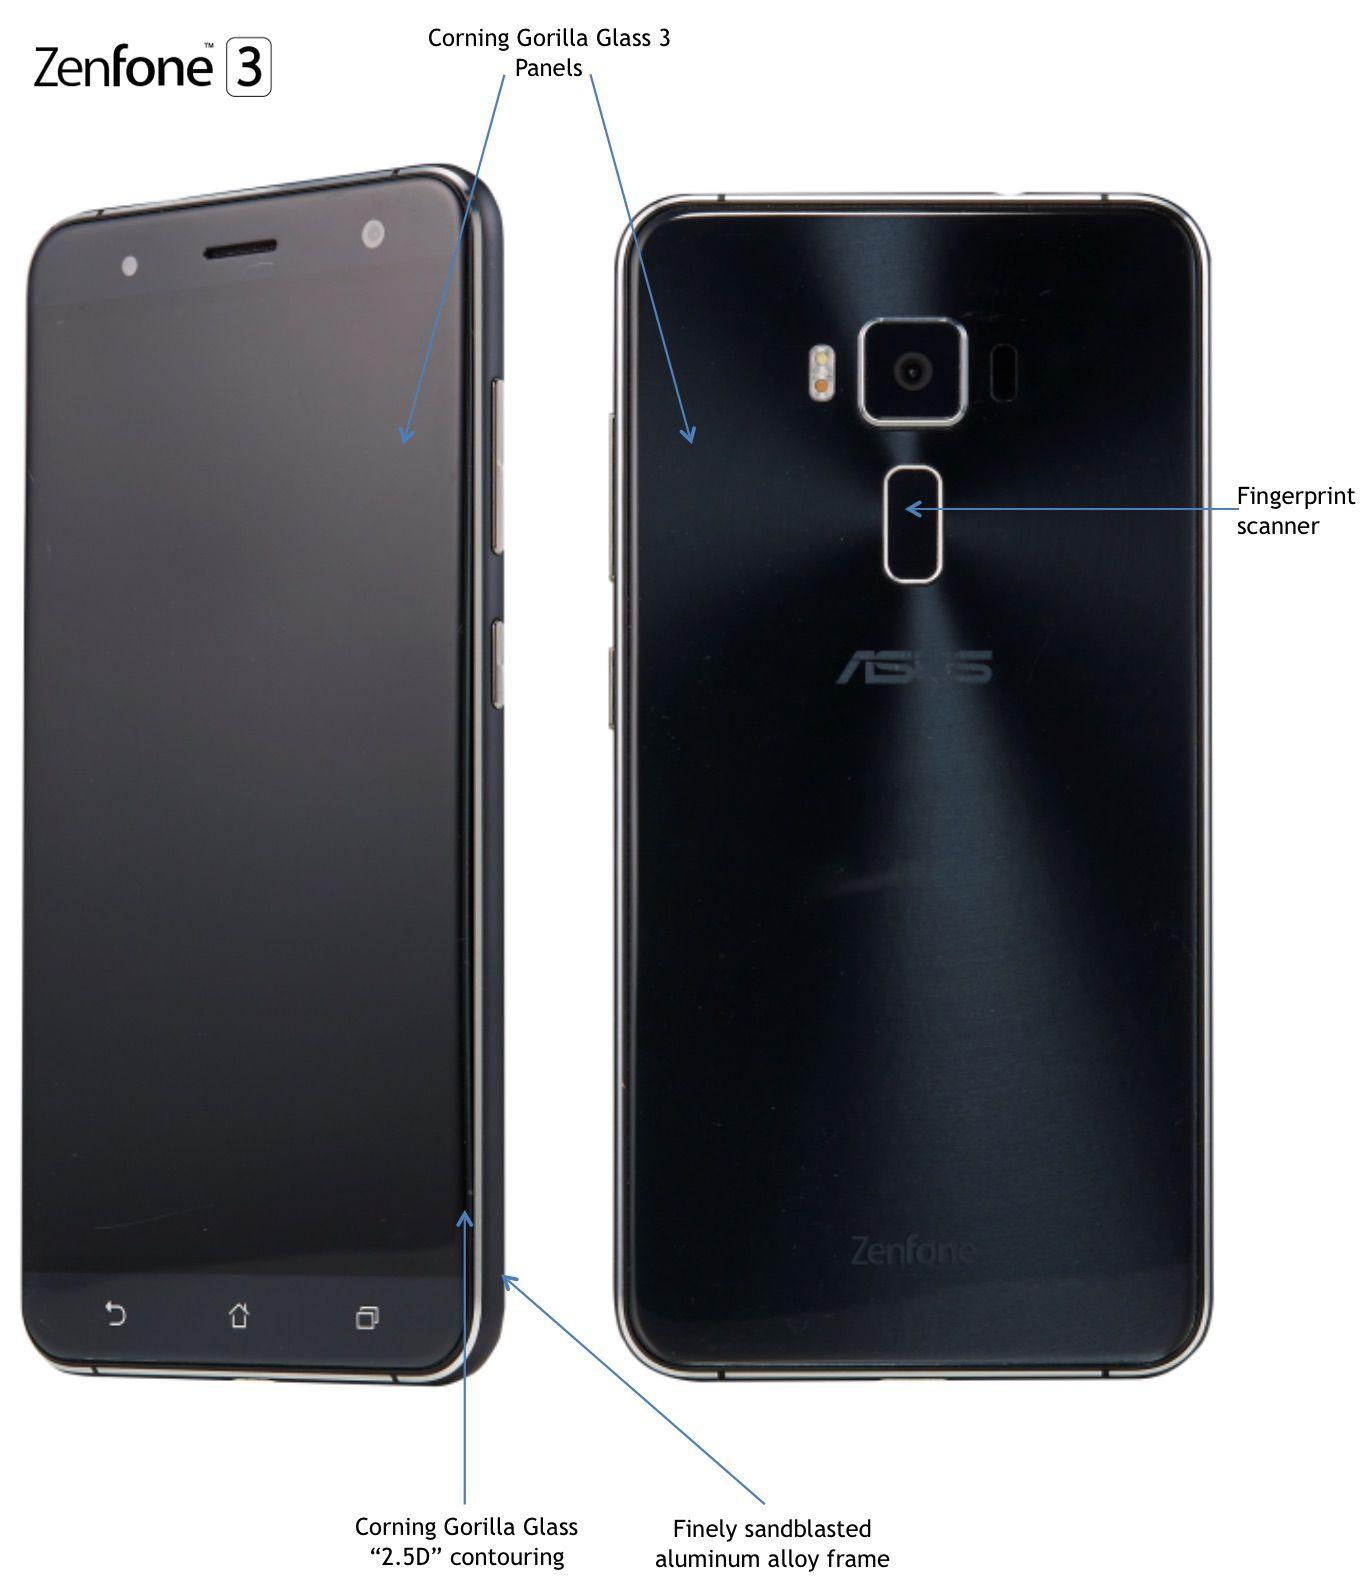 Asus Announces Zenfone 3 Alongside Premium Deluxe And